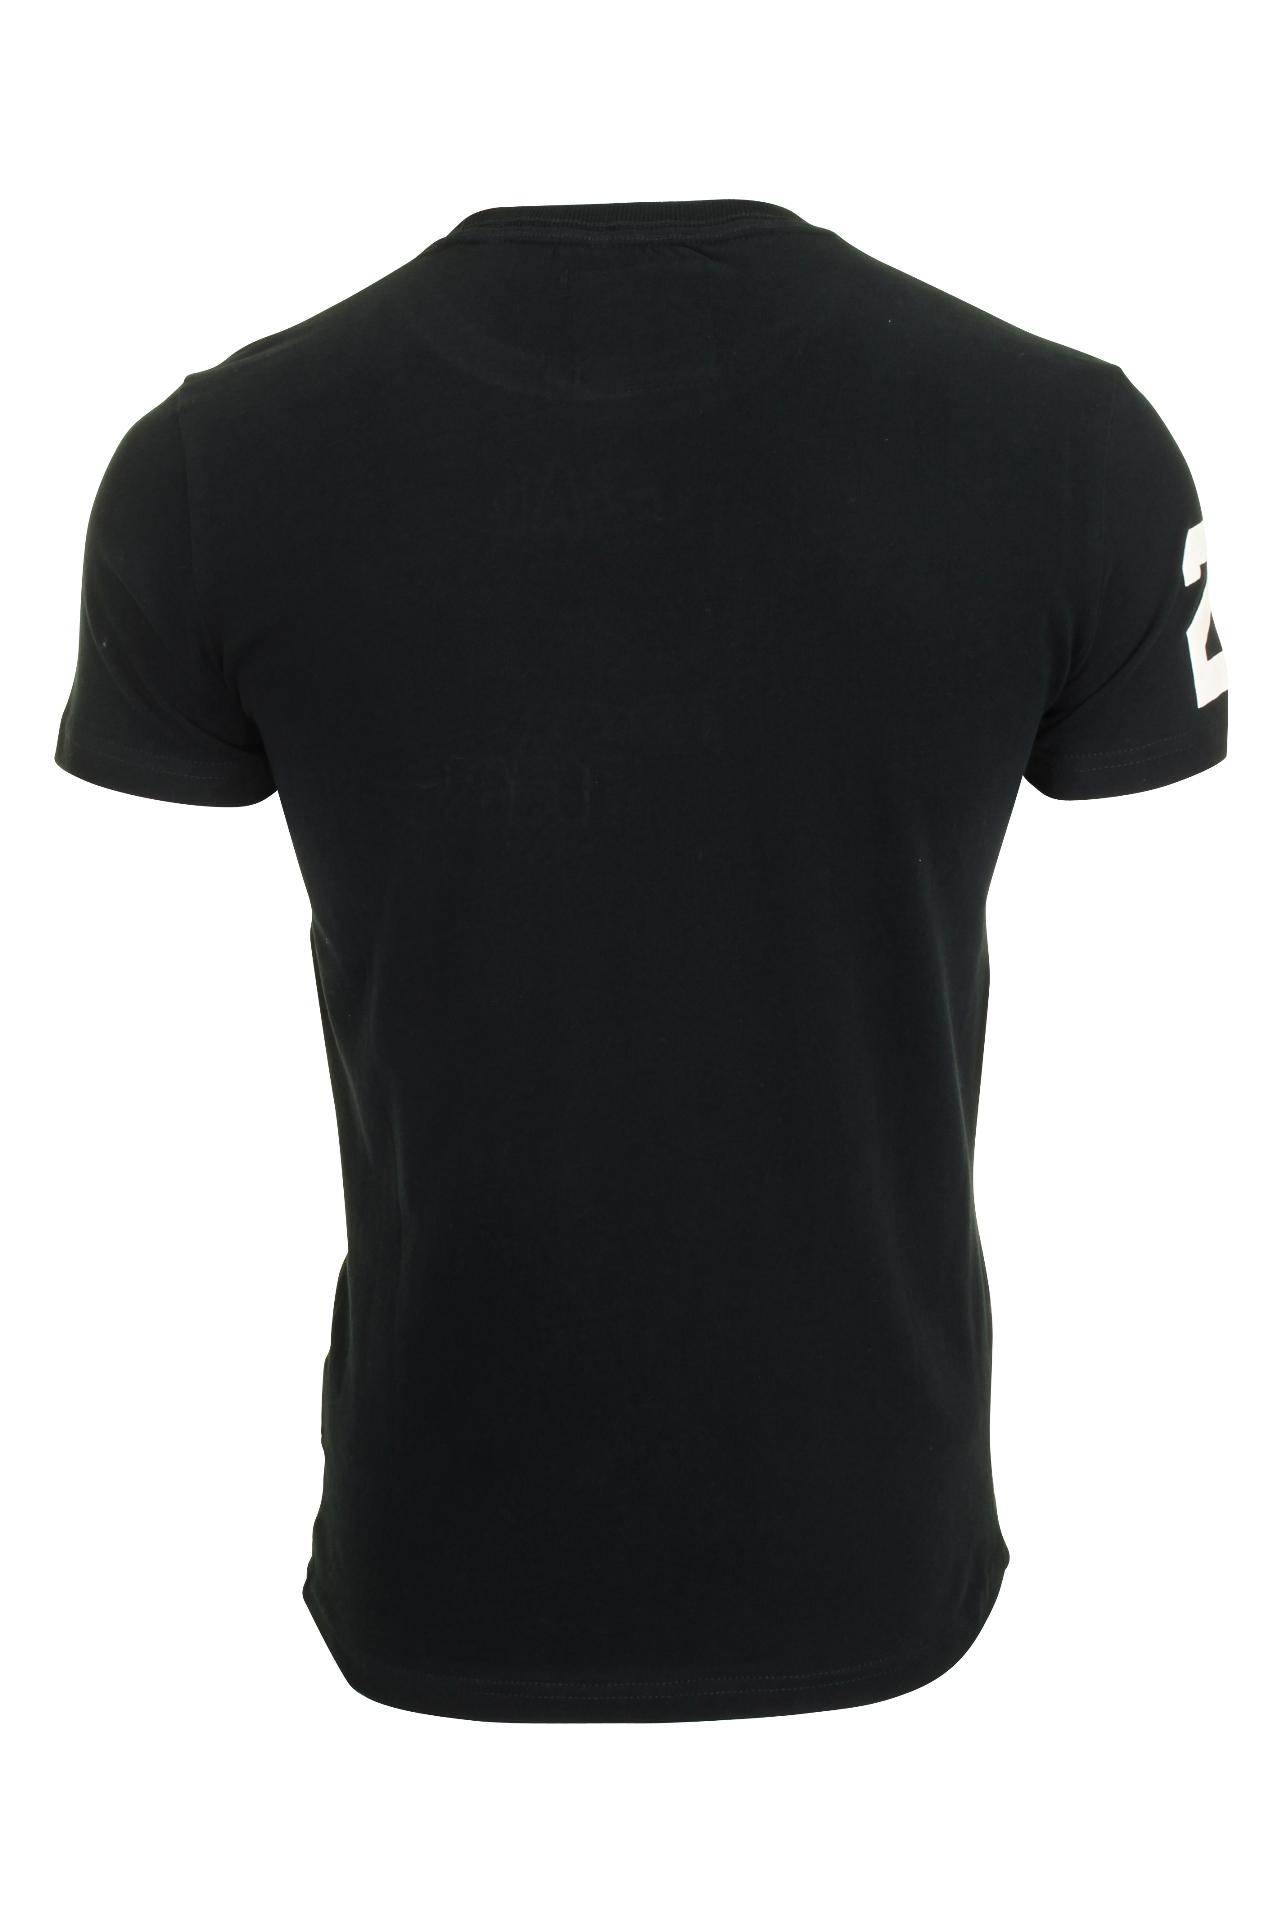 Superdry-Mens-039-Vintage-Logo-039-T-Shirt thumbnail 4